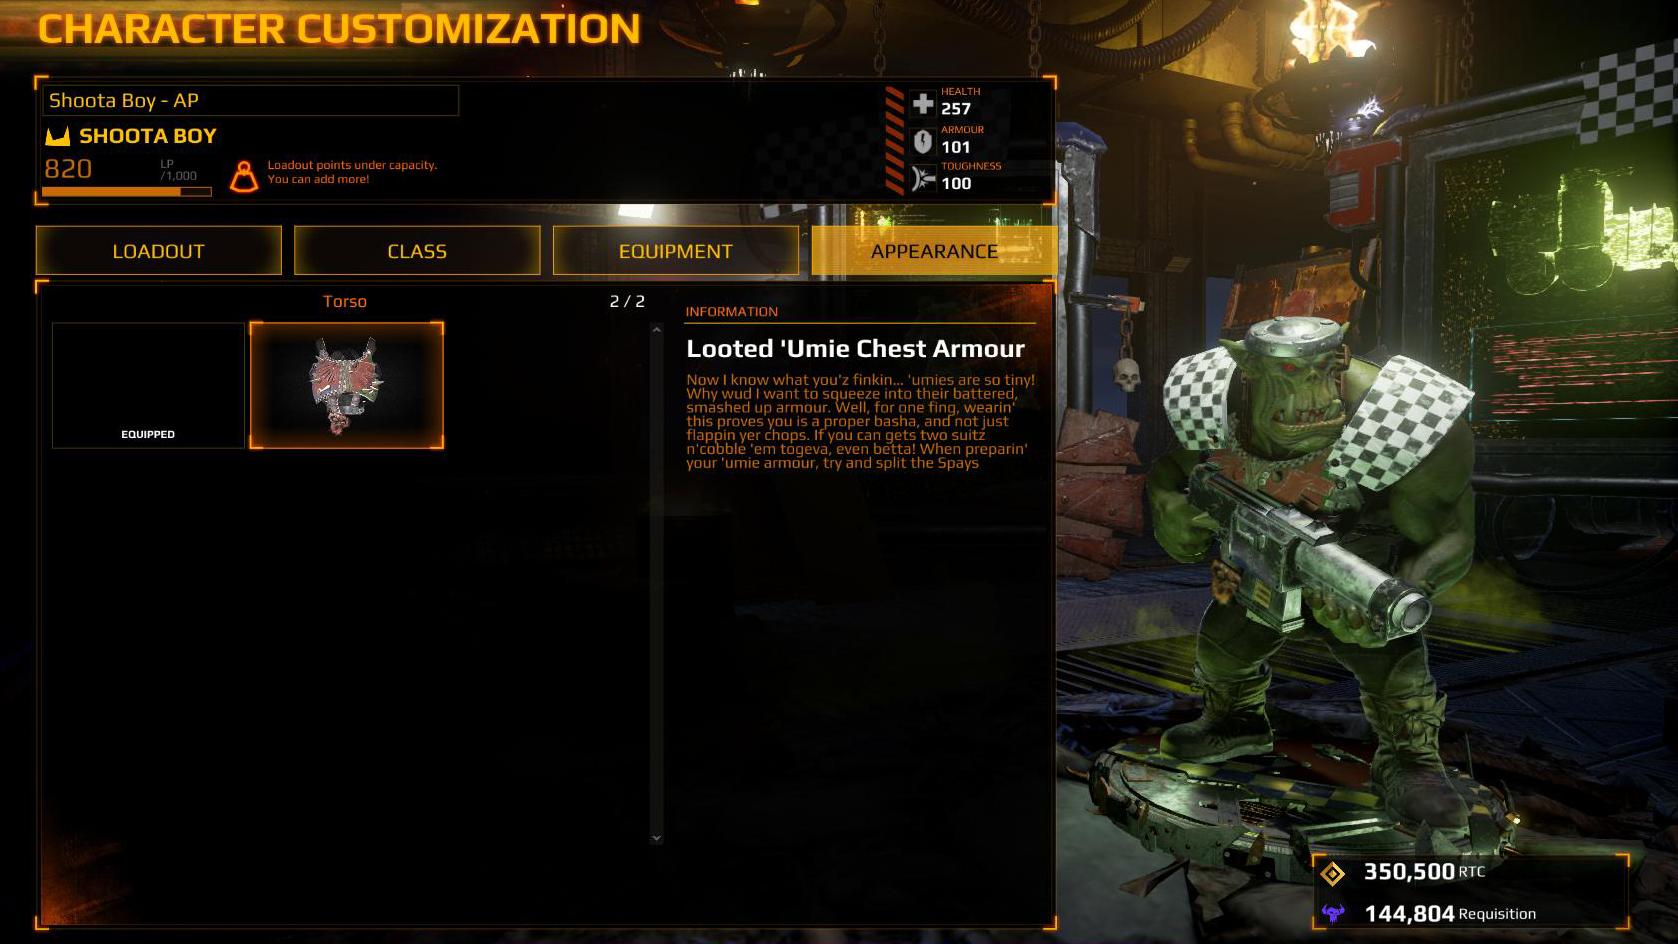 Warhammer 40,000: Eternal Crusade - Waaagh! Pack 2017 pc game Img-4